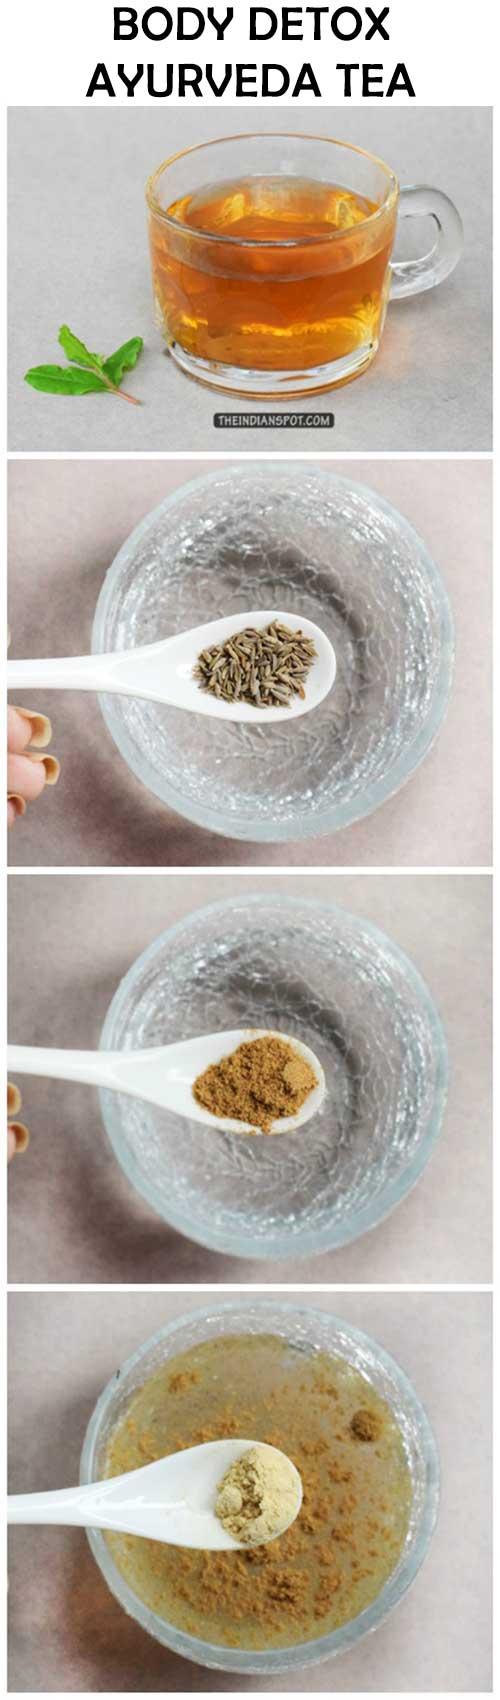 AYURVEDA TEA FOR DETOX